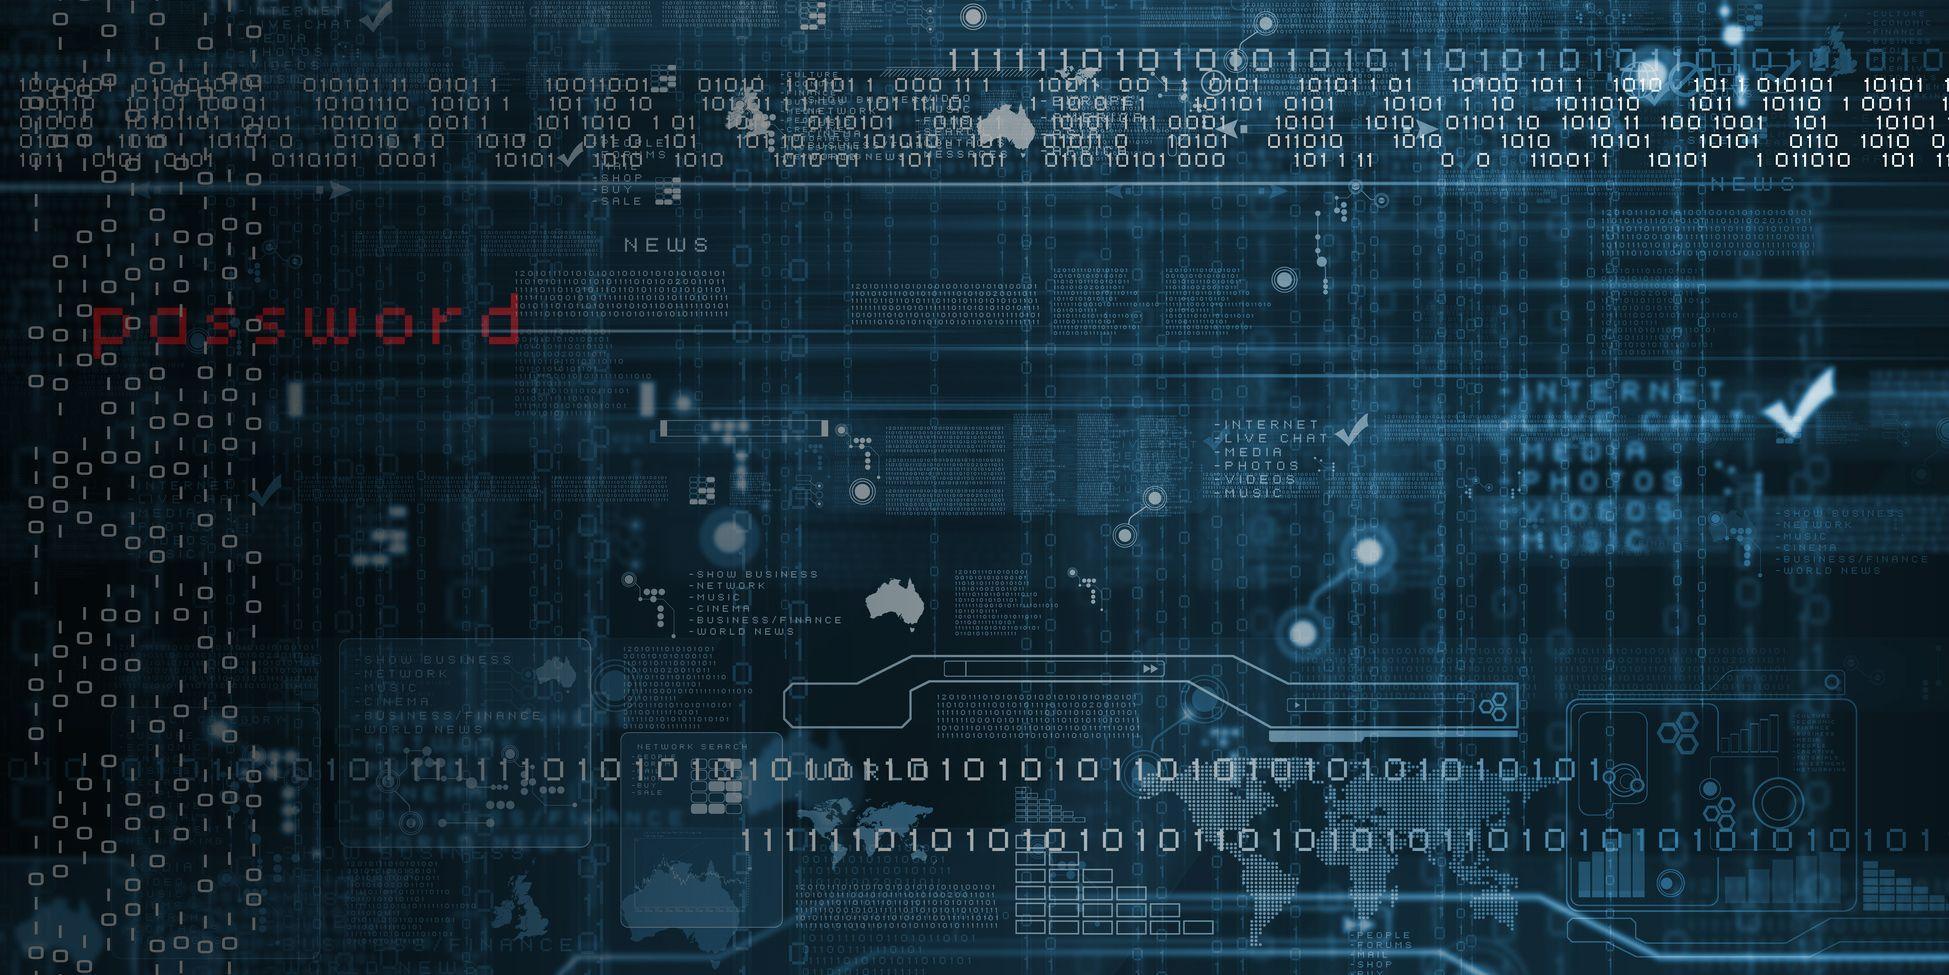 3d Cisco Hd 1920x1080 Wallpaper Cyber Security Wallpapers Wallpaper Cave